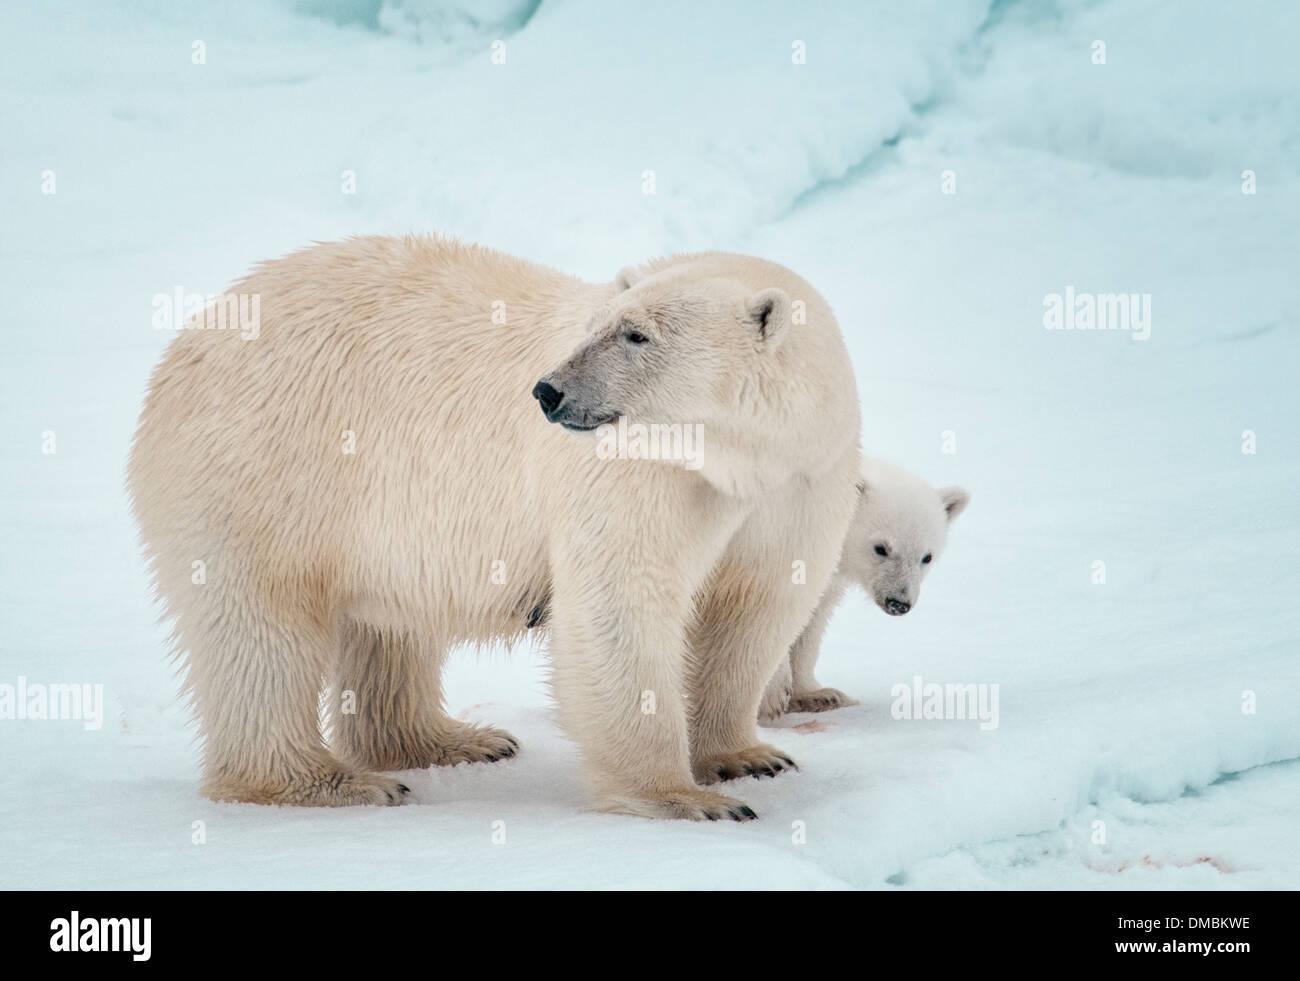 Oso Polar Madre con Cub escondiéndose detrás de ella, Ursus maritimus, Olgastretet Pack Ice, Spitsbergen, el archipiélago de Svalbard, Noruega Imagen De Stock